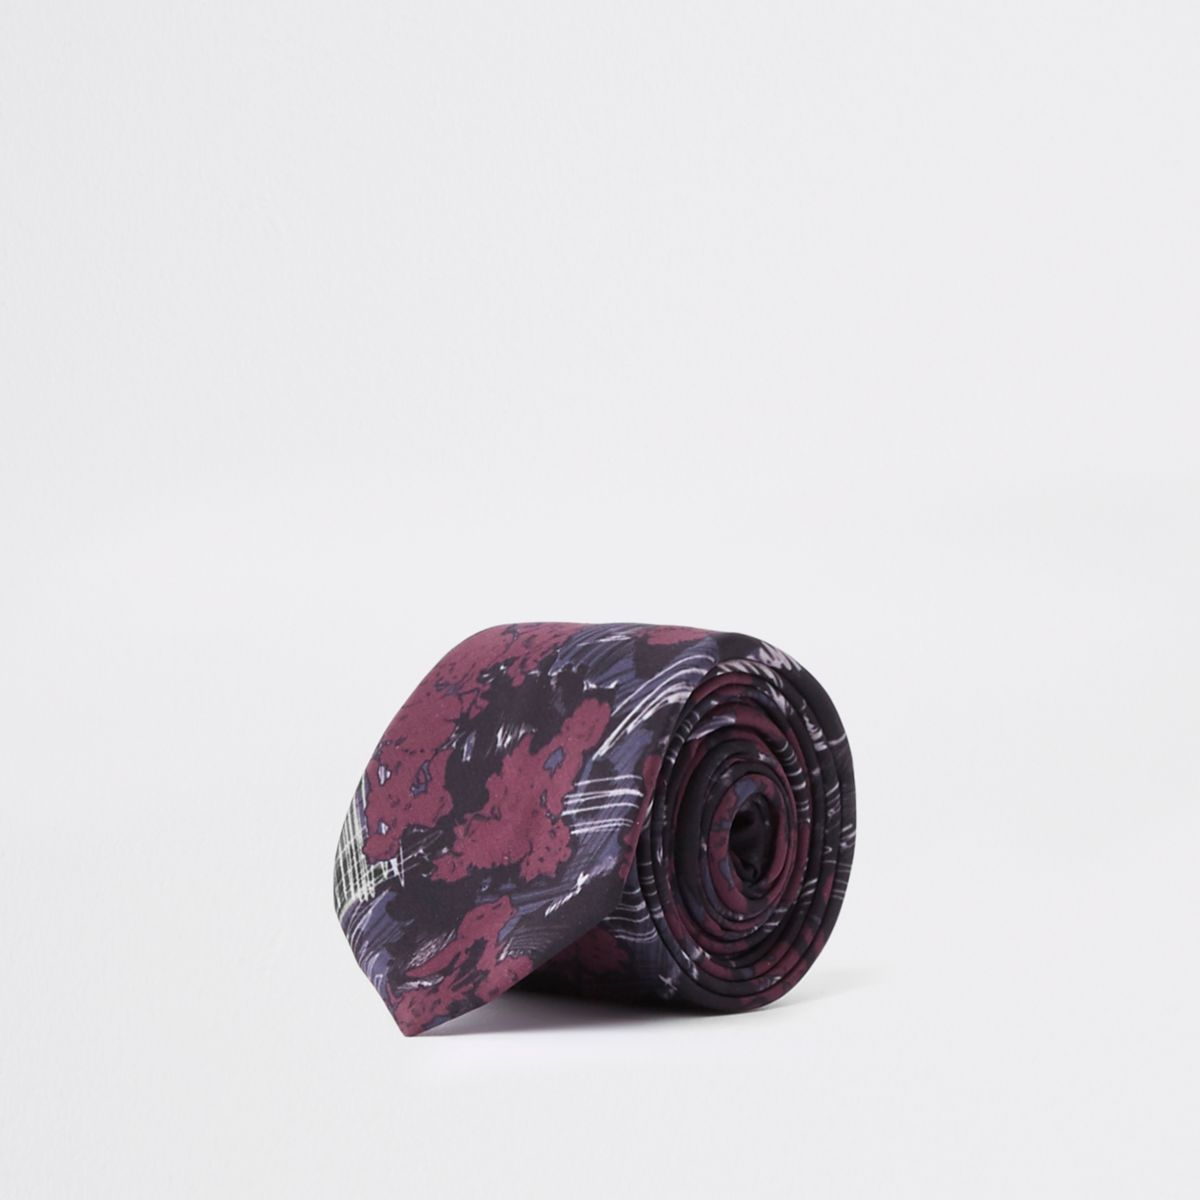 Black rose floral tie